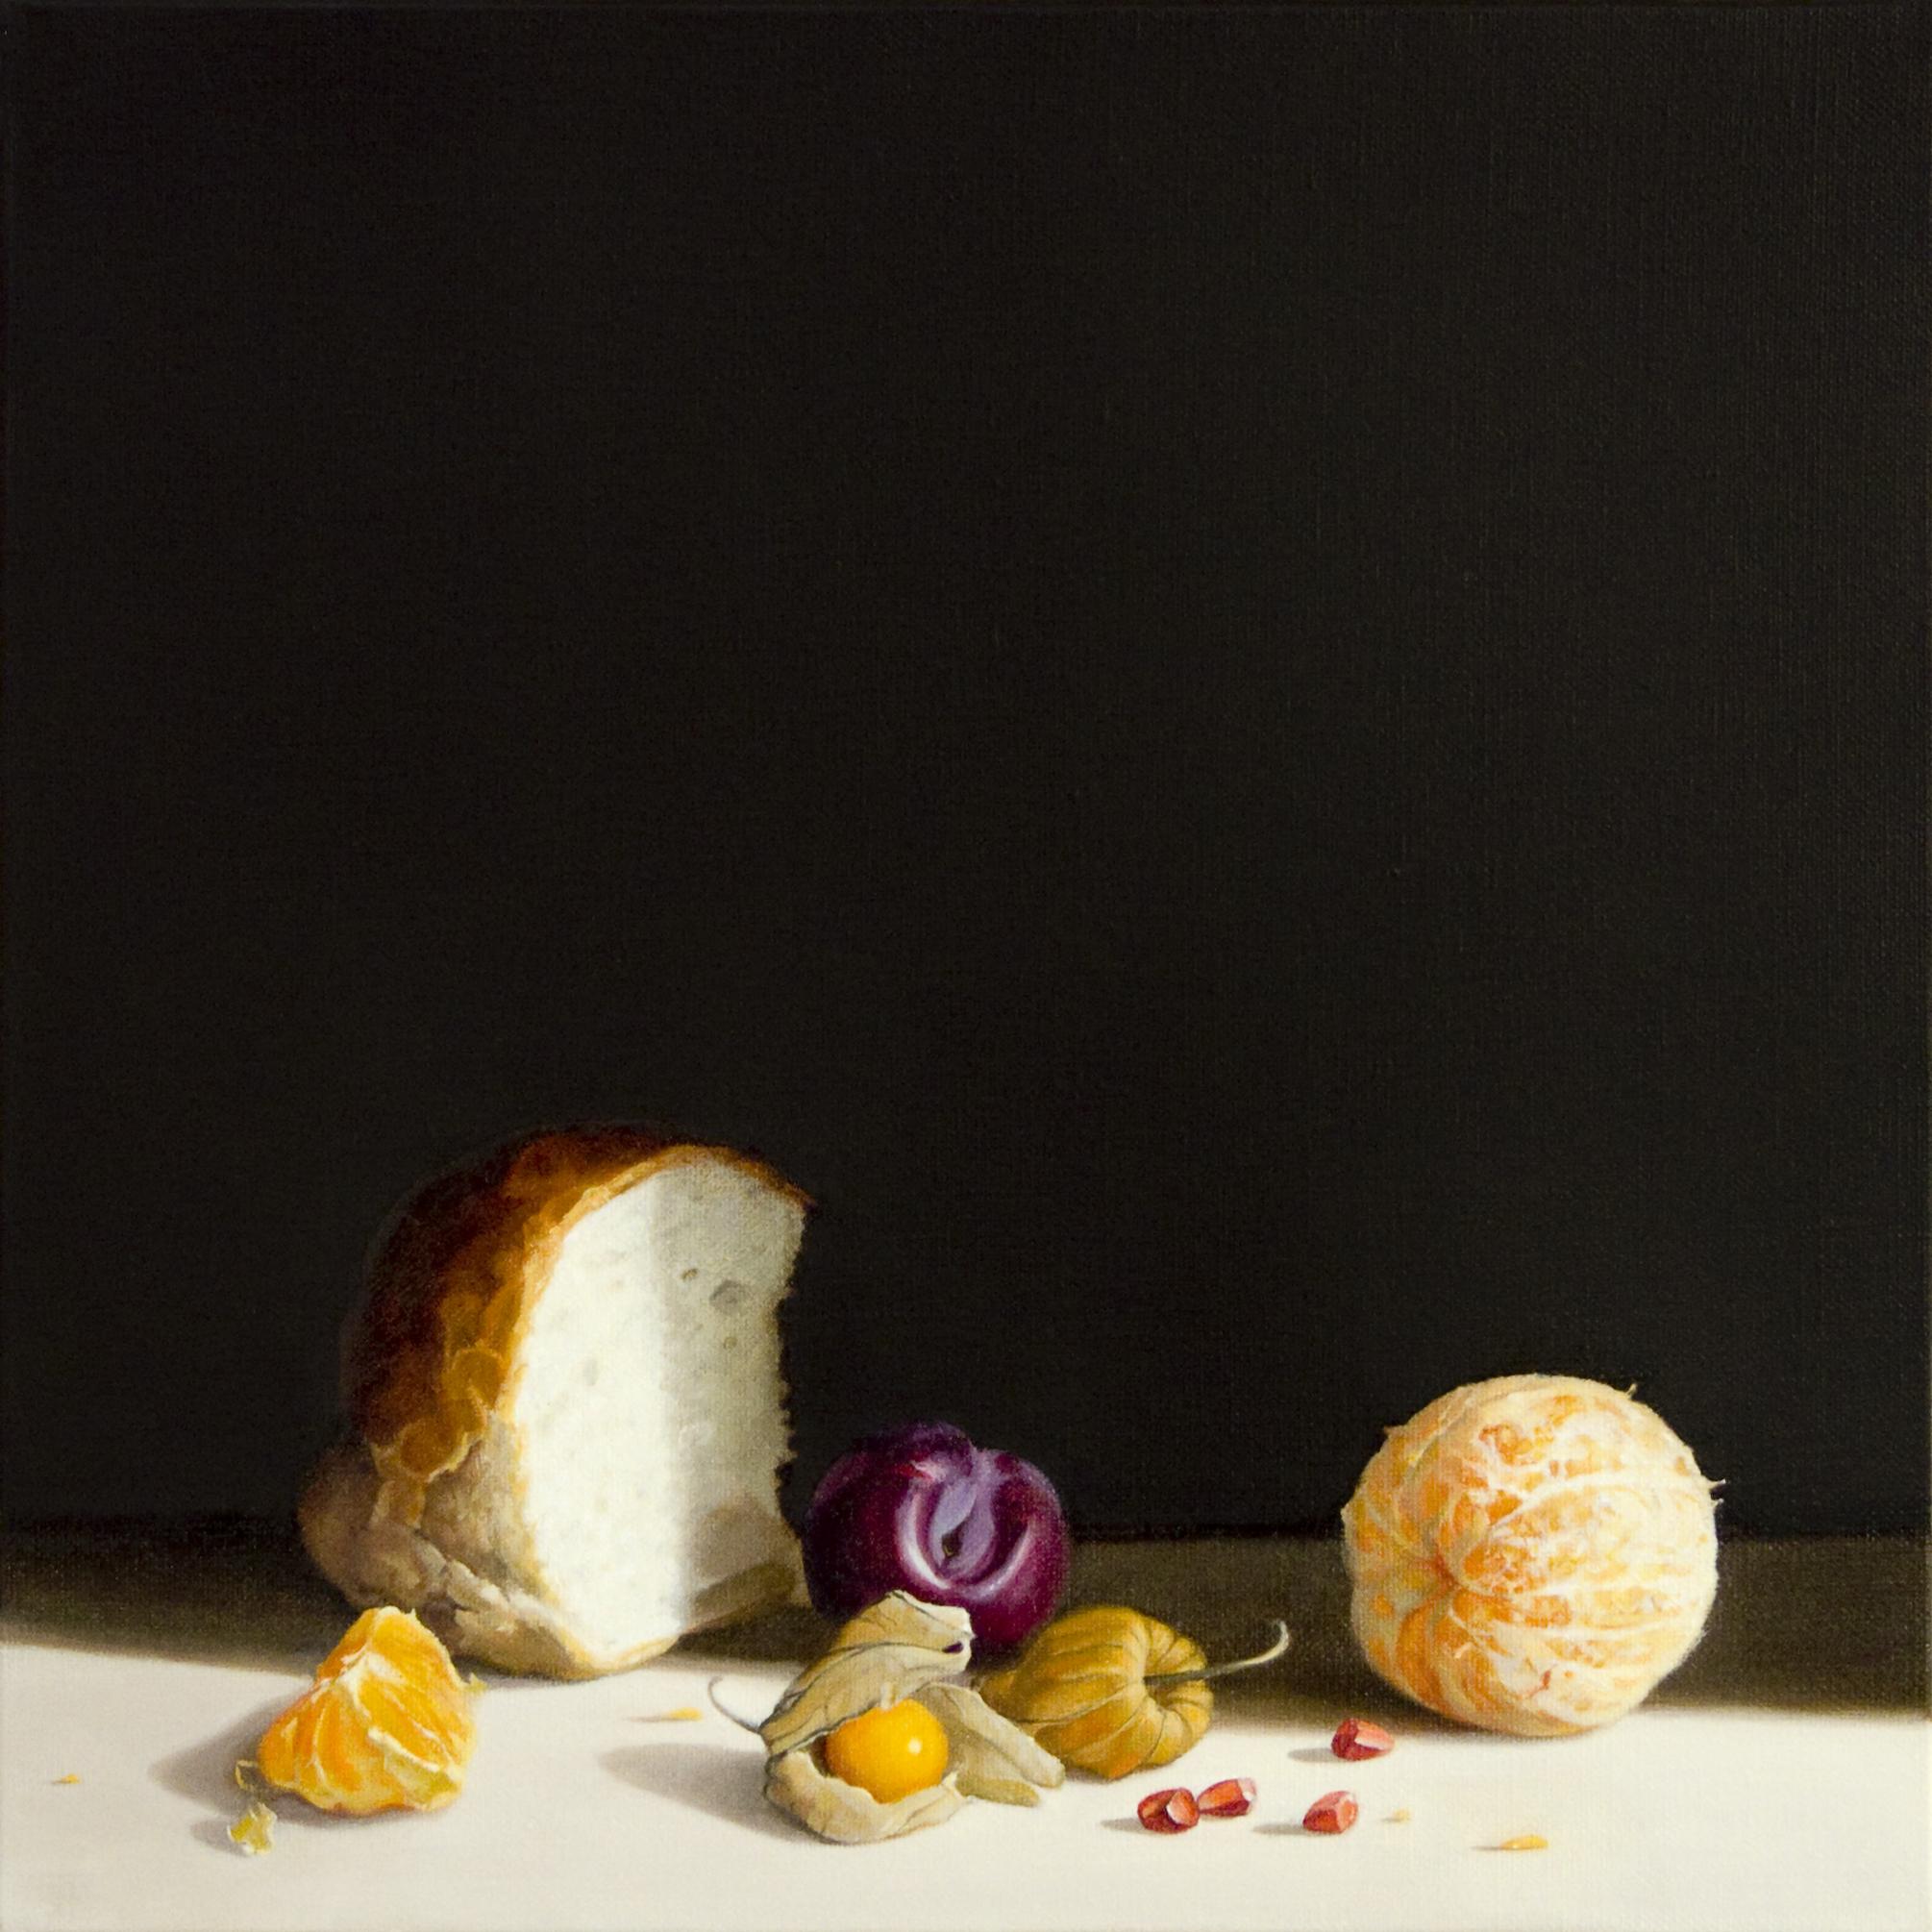 Bread and Orange, Oil on Linen, 40x40cm